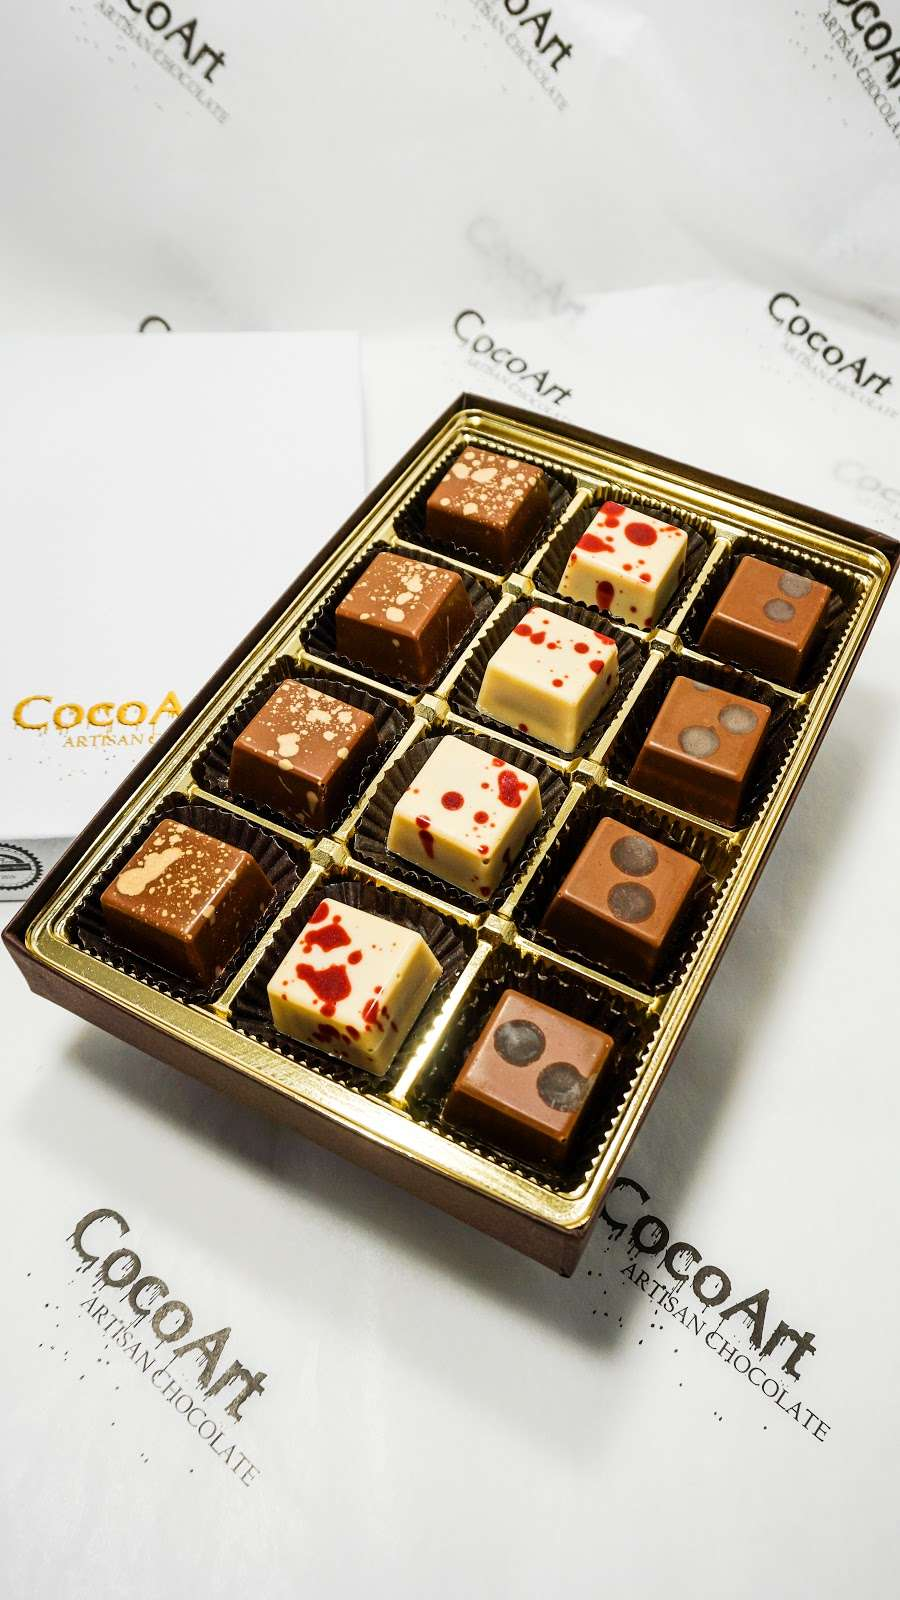 CocoArt Chocolate - store    Photo 6 of 10   Address: 20 Prag Blvd #002, Monroe, NY 10950, USA   Phone: (845) 248-1617